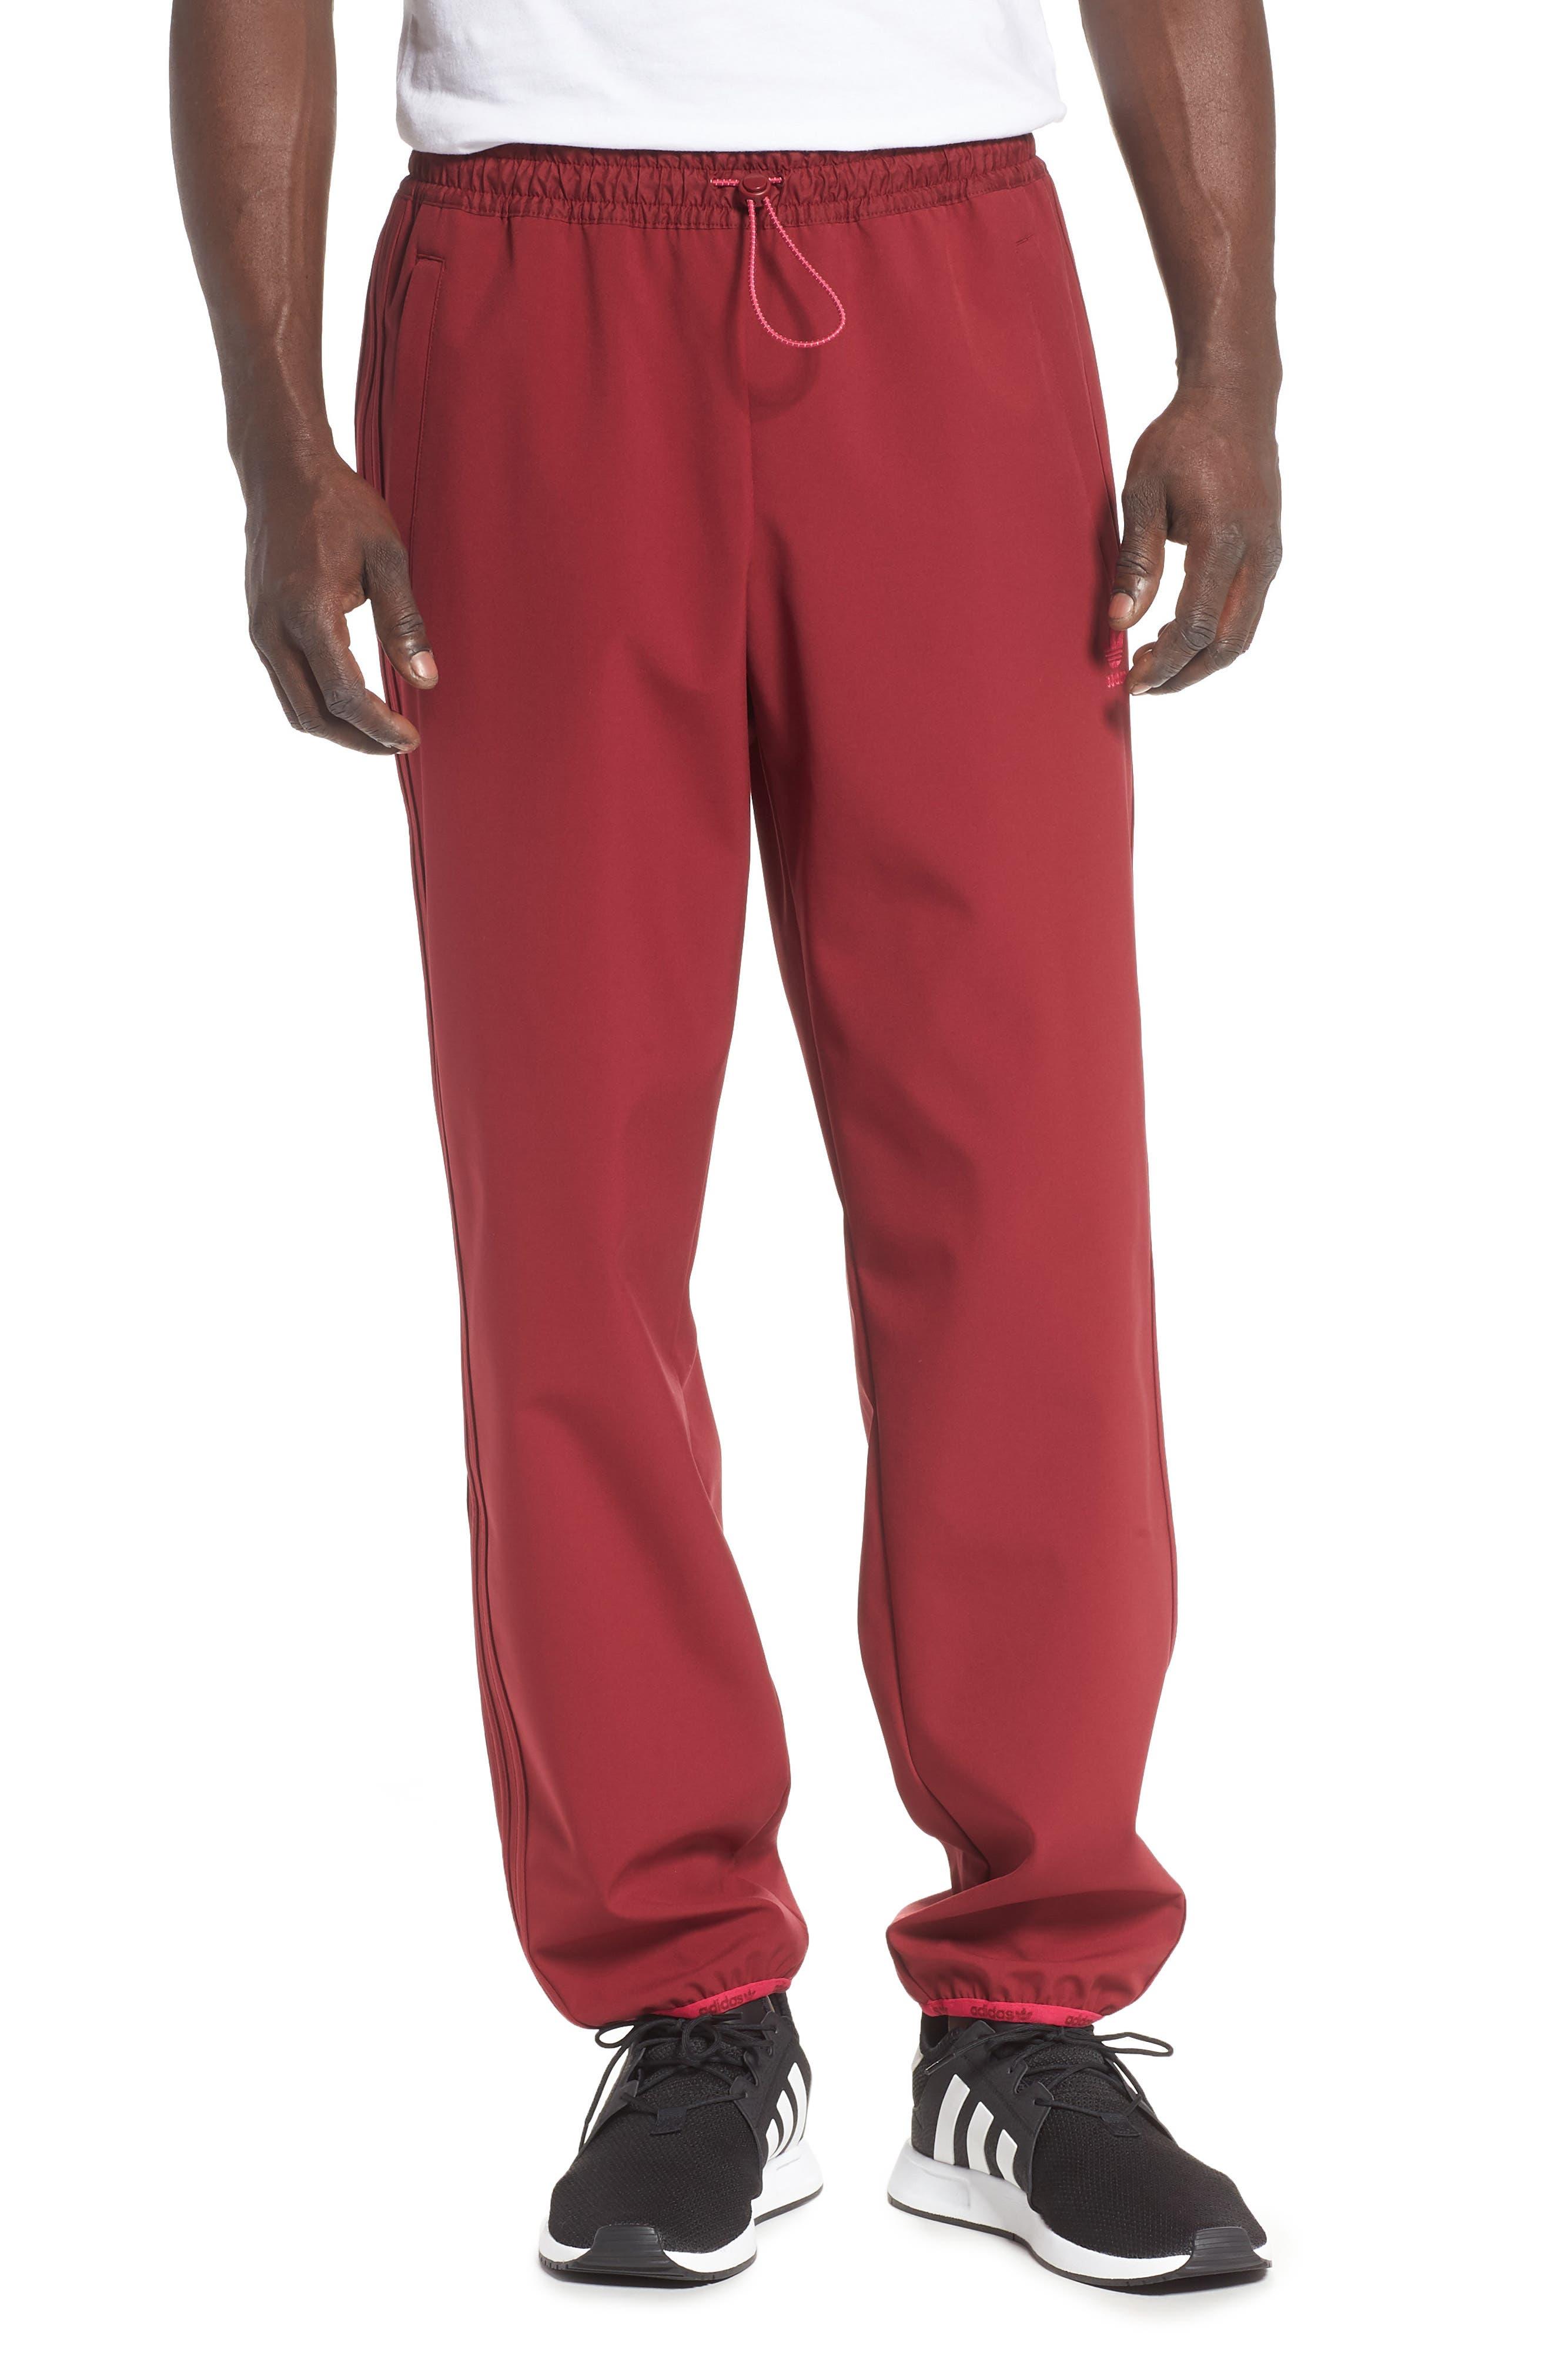 Image of ADIDAS ORIGINALS Winterized Track Pants